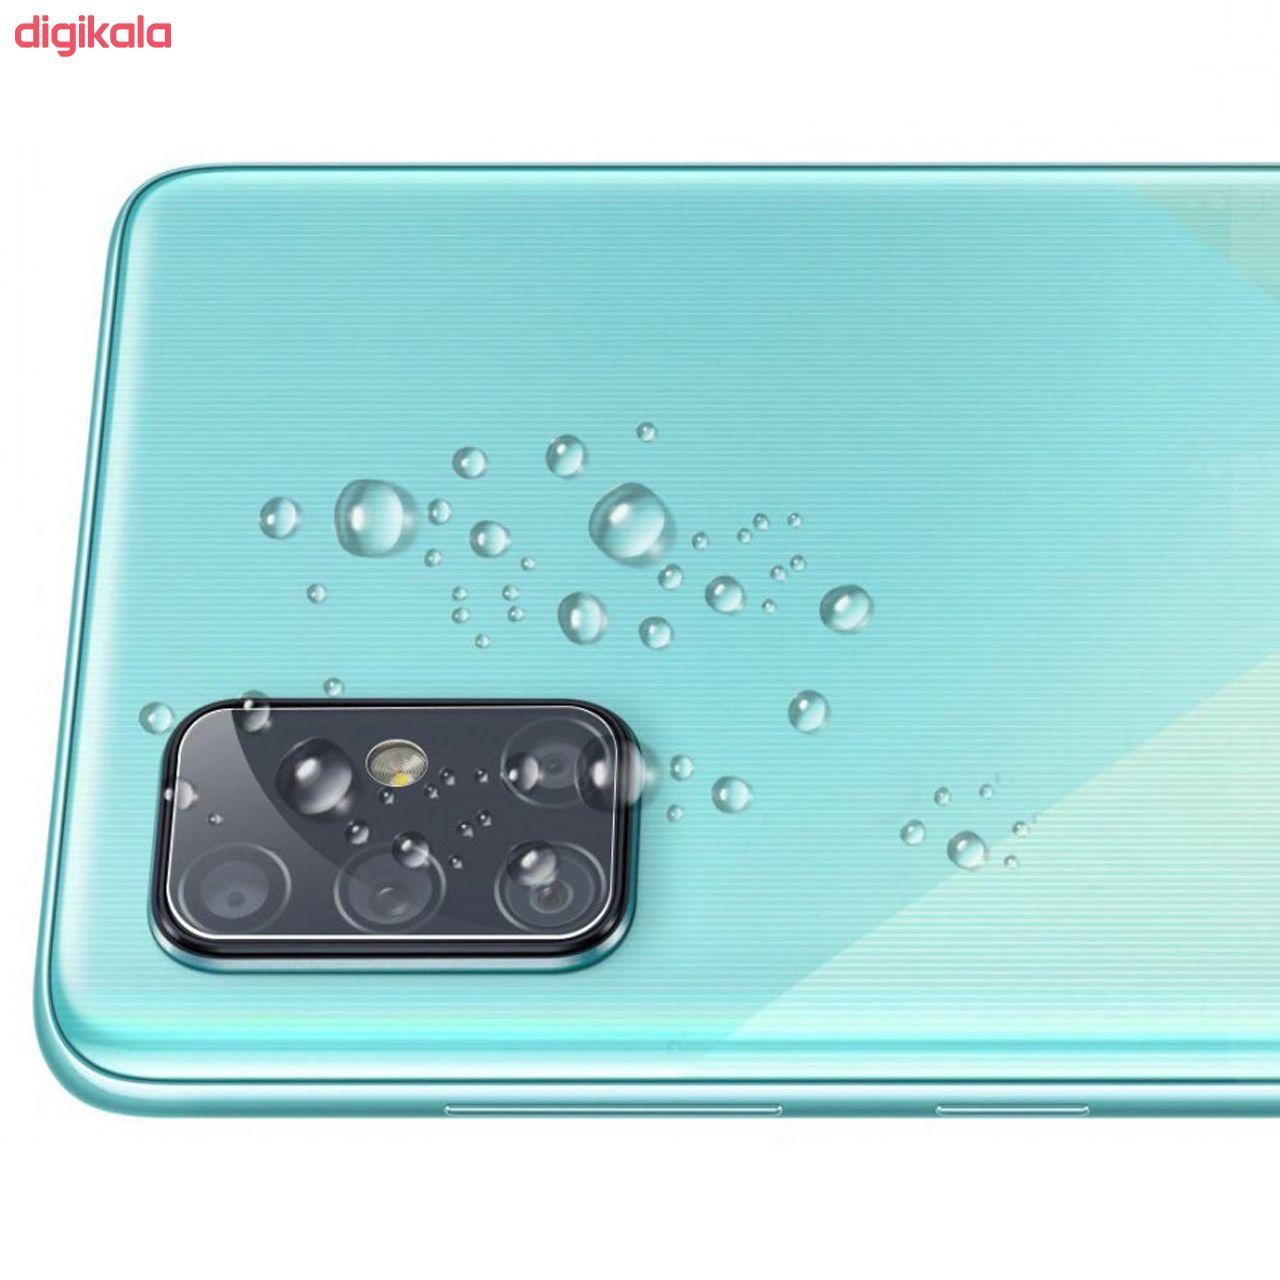 محافظ لنز دوربین سیحان مدل GLP مناسب برای گوشی موبایل سامسونگ Galaxy A71 main 1 5